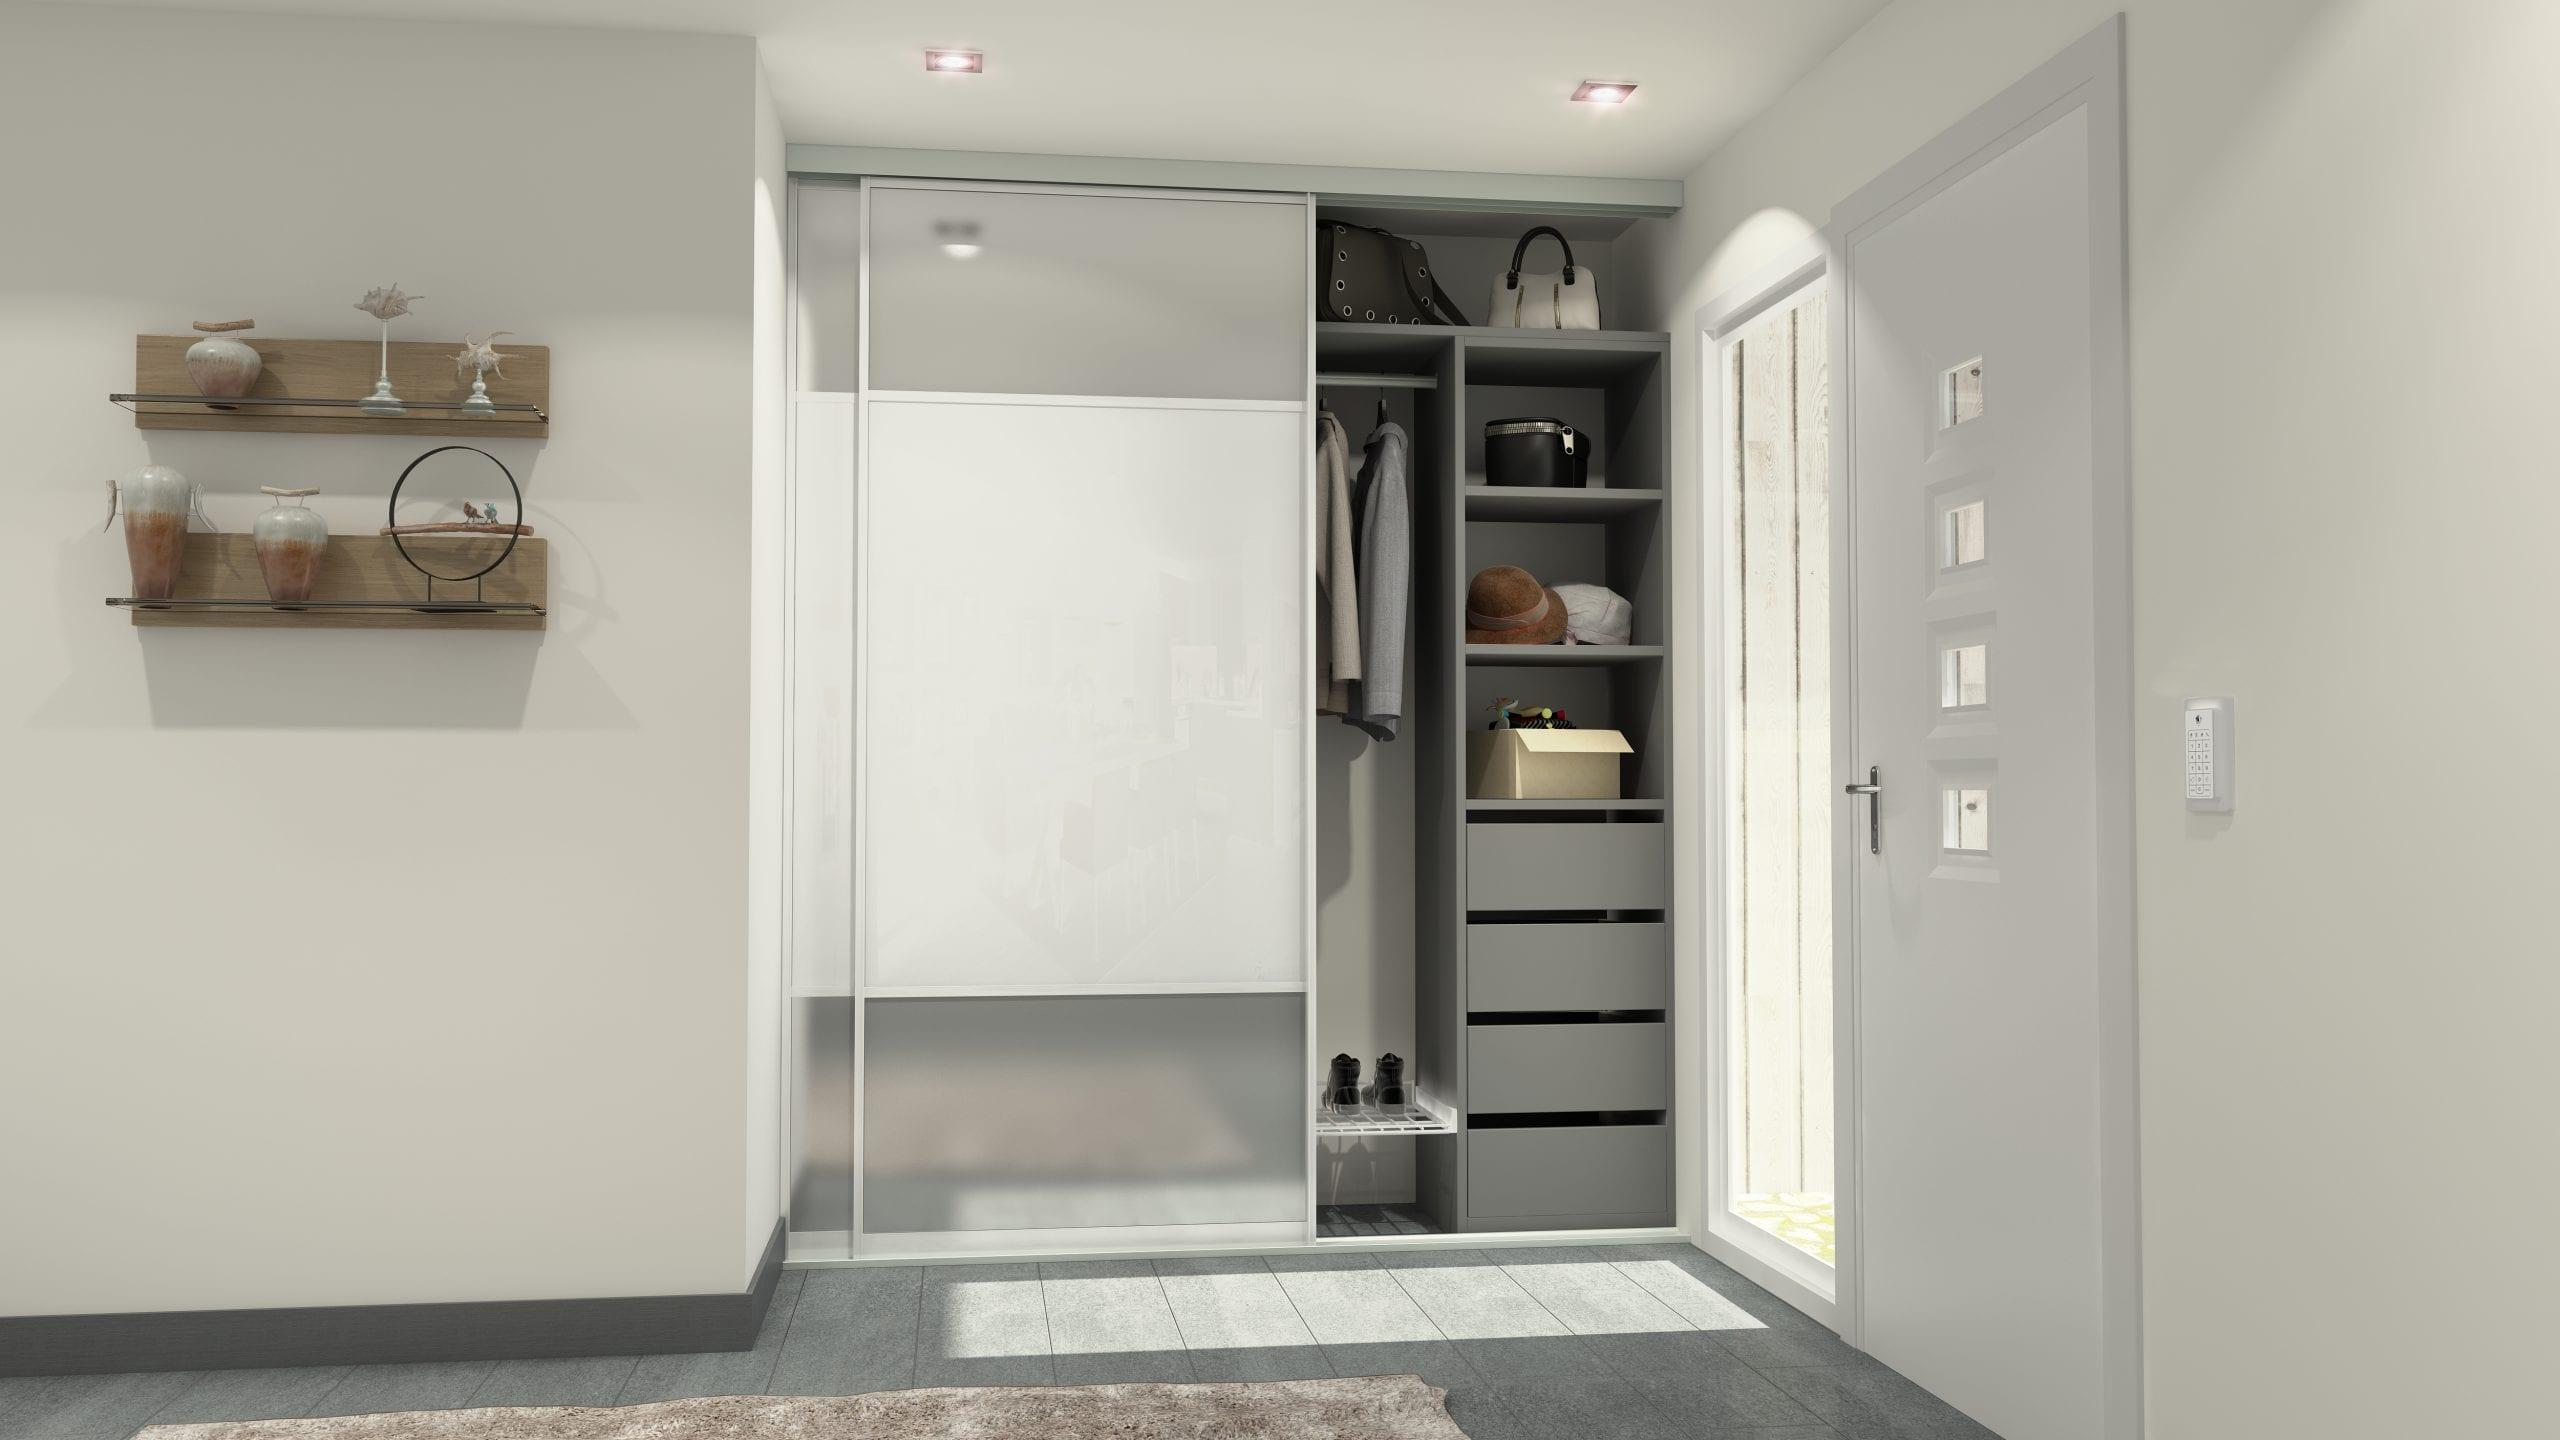 Ønsker du orden i garderoben din? Les om smarte tips her: